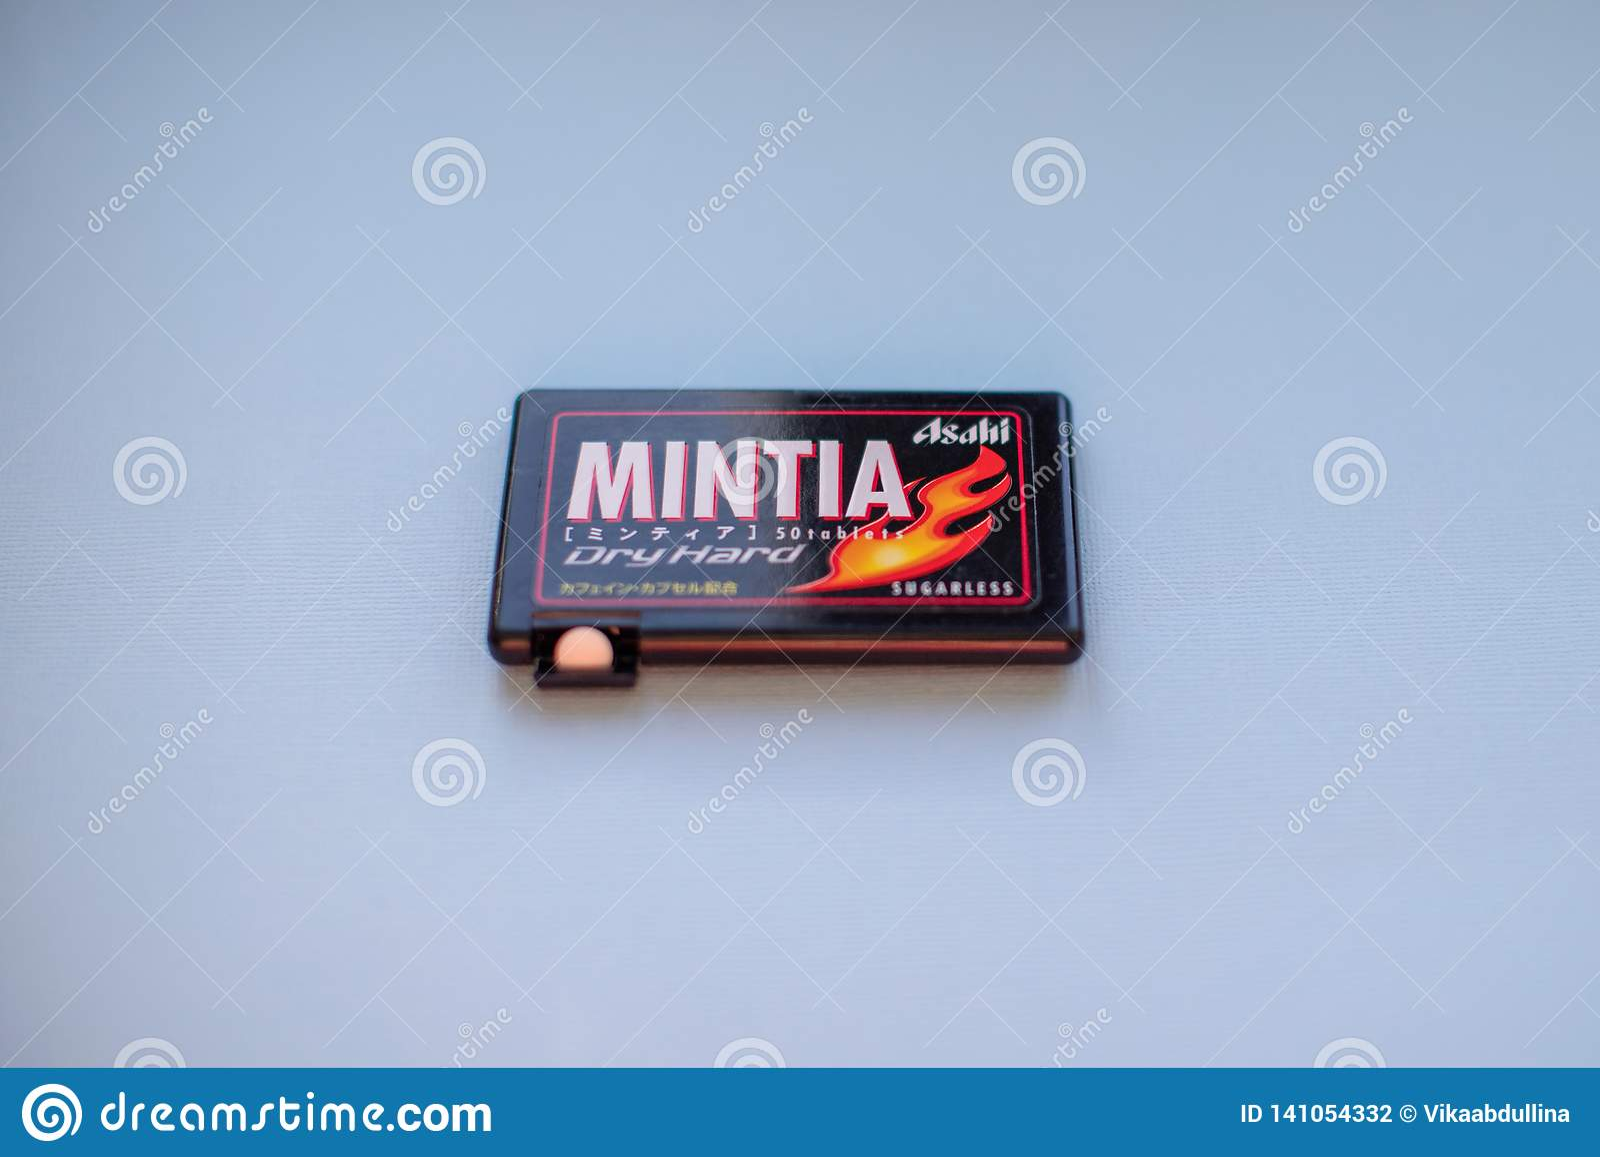 Mintia -在日本生产的干坚硬无糖的薄菏由品牌朝日